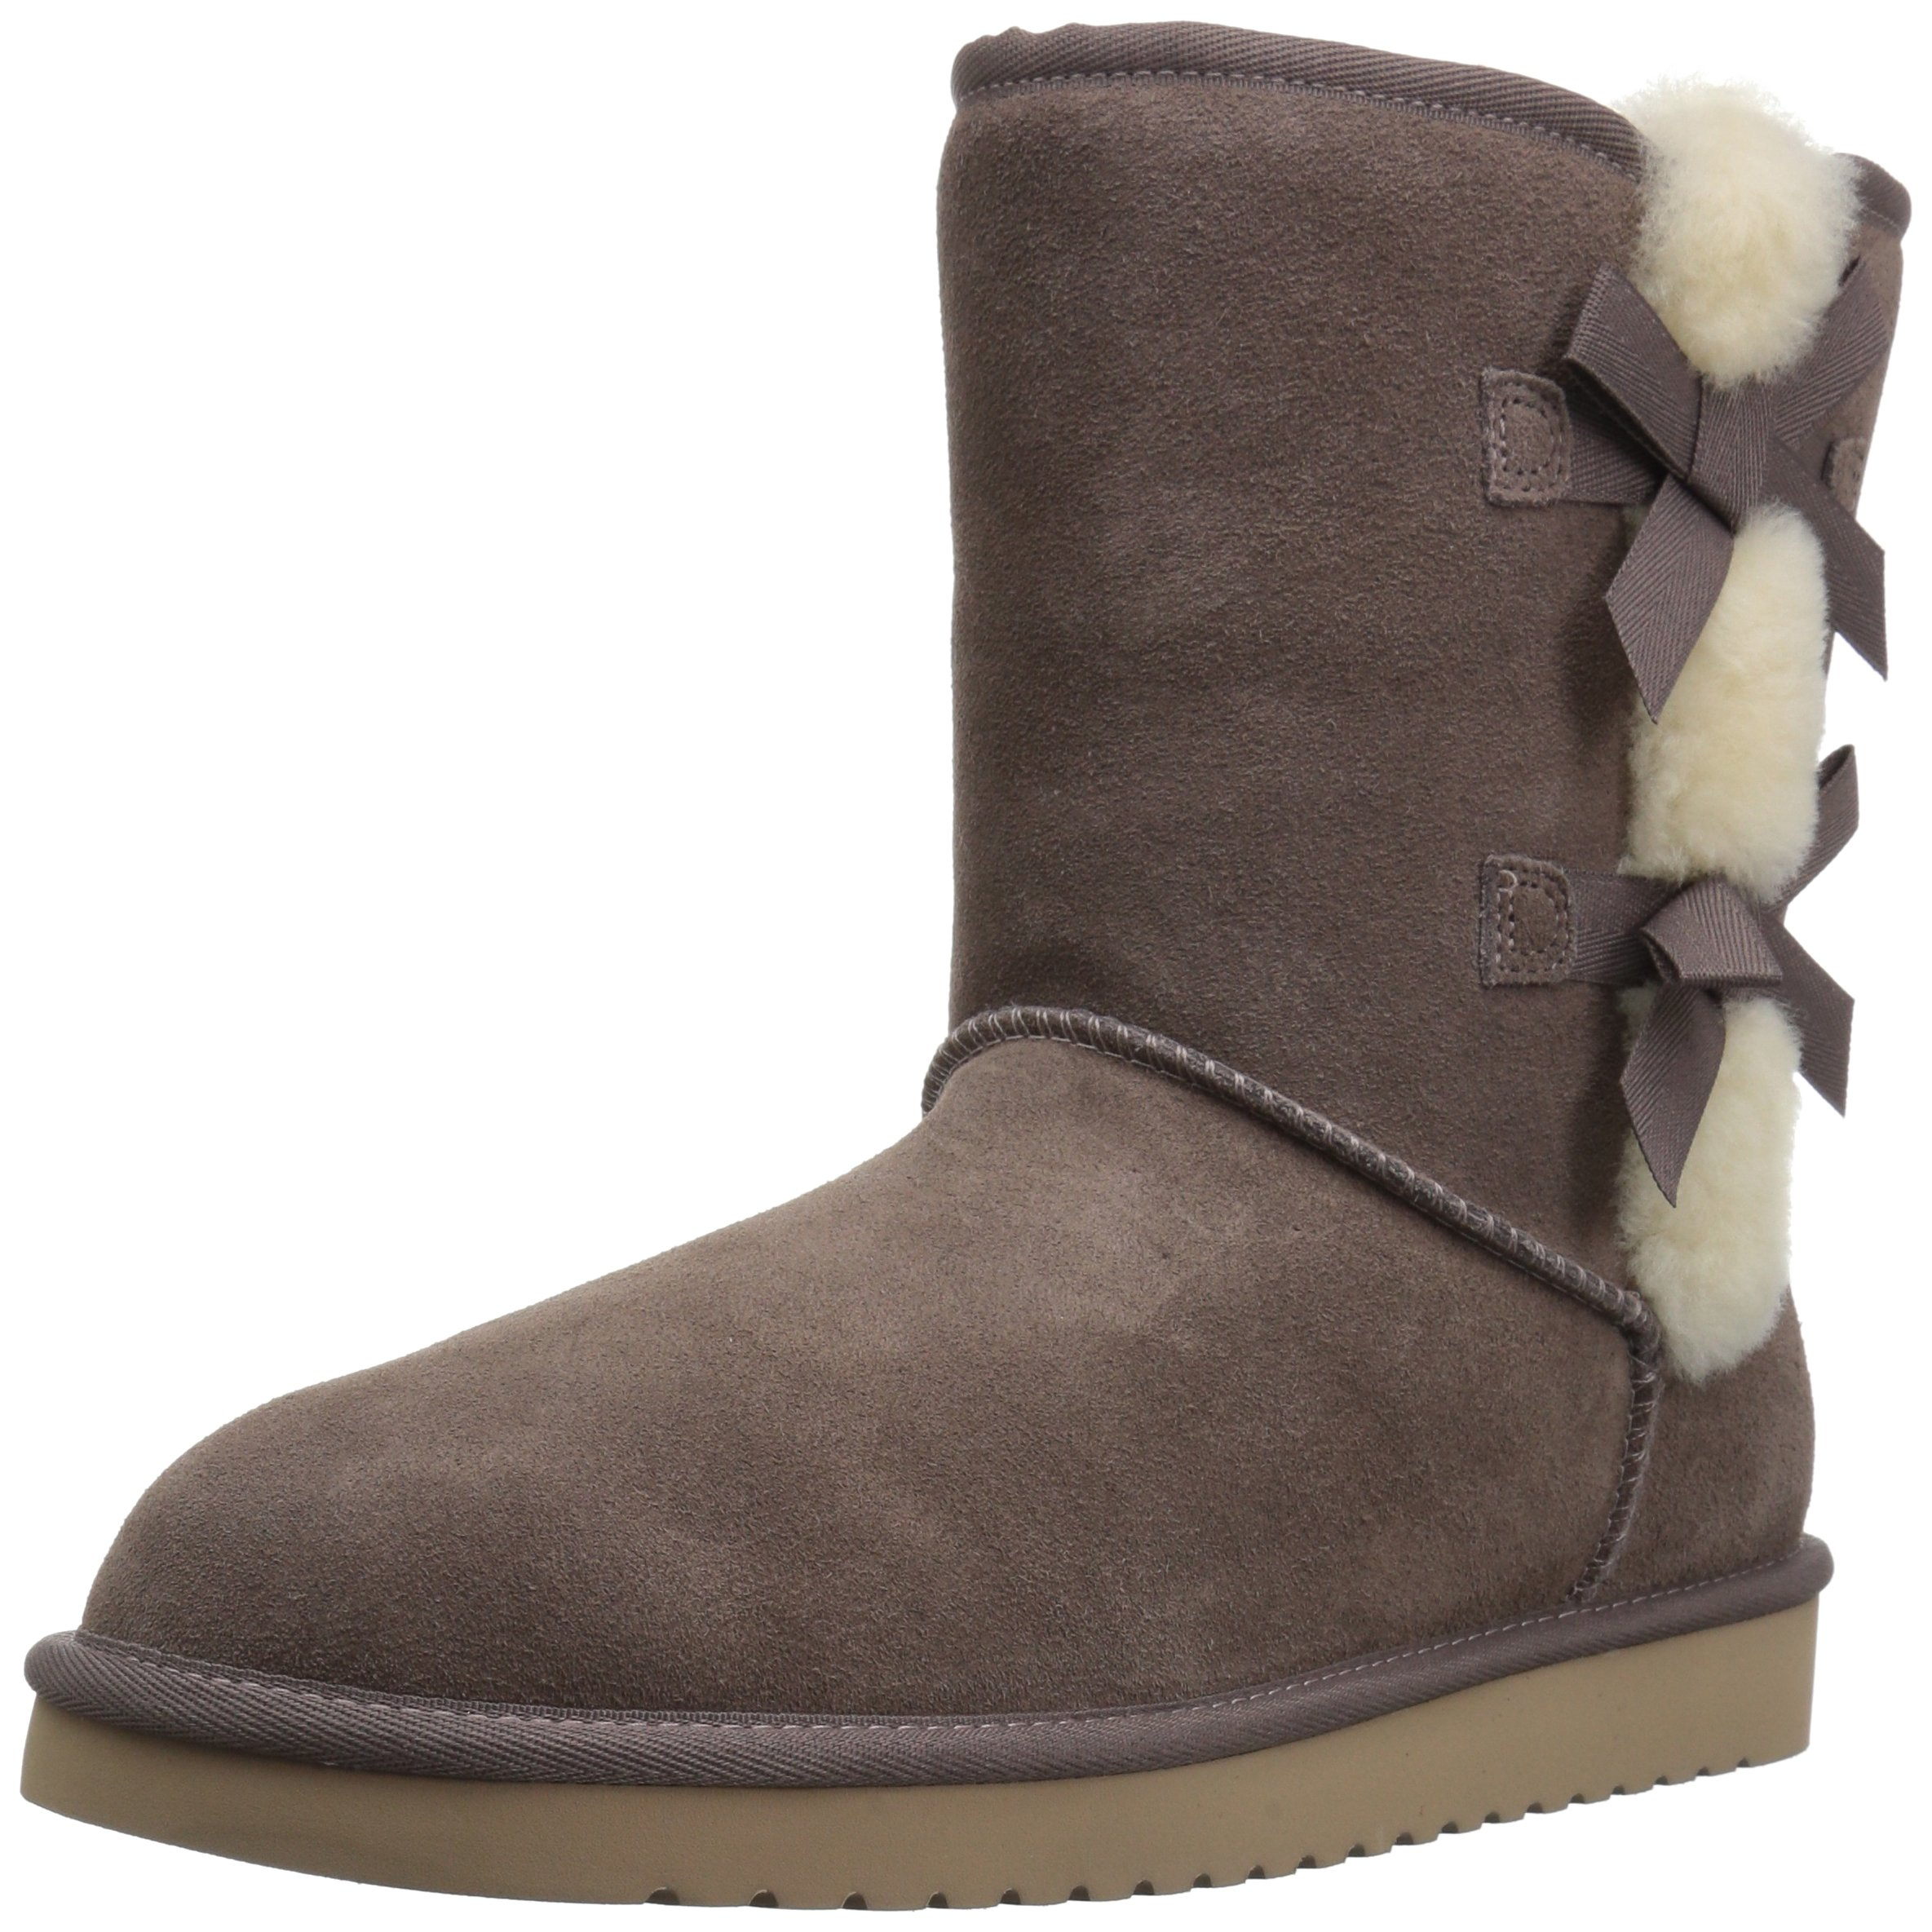 477d7a223a3 Koolaburra by UGG Women's Victoria Short Fashion Boot, Cinder, 08 M ...